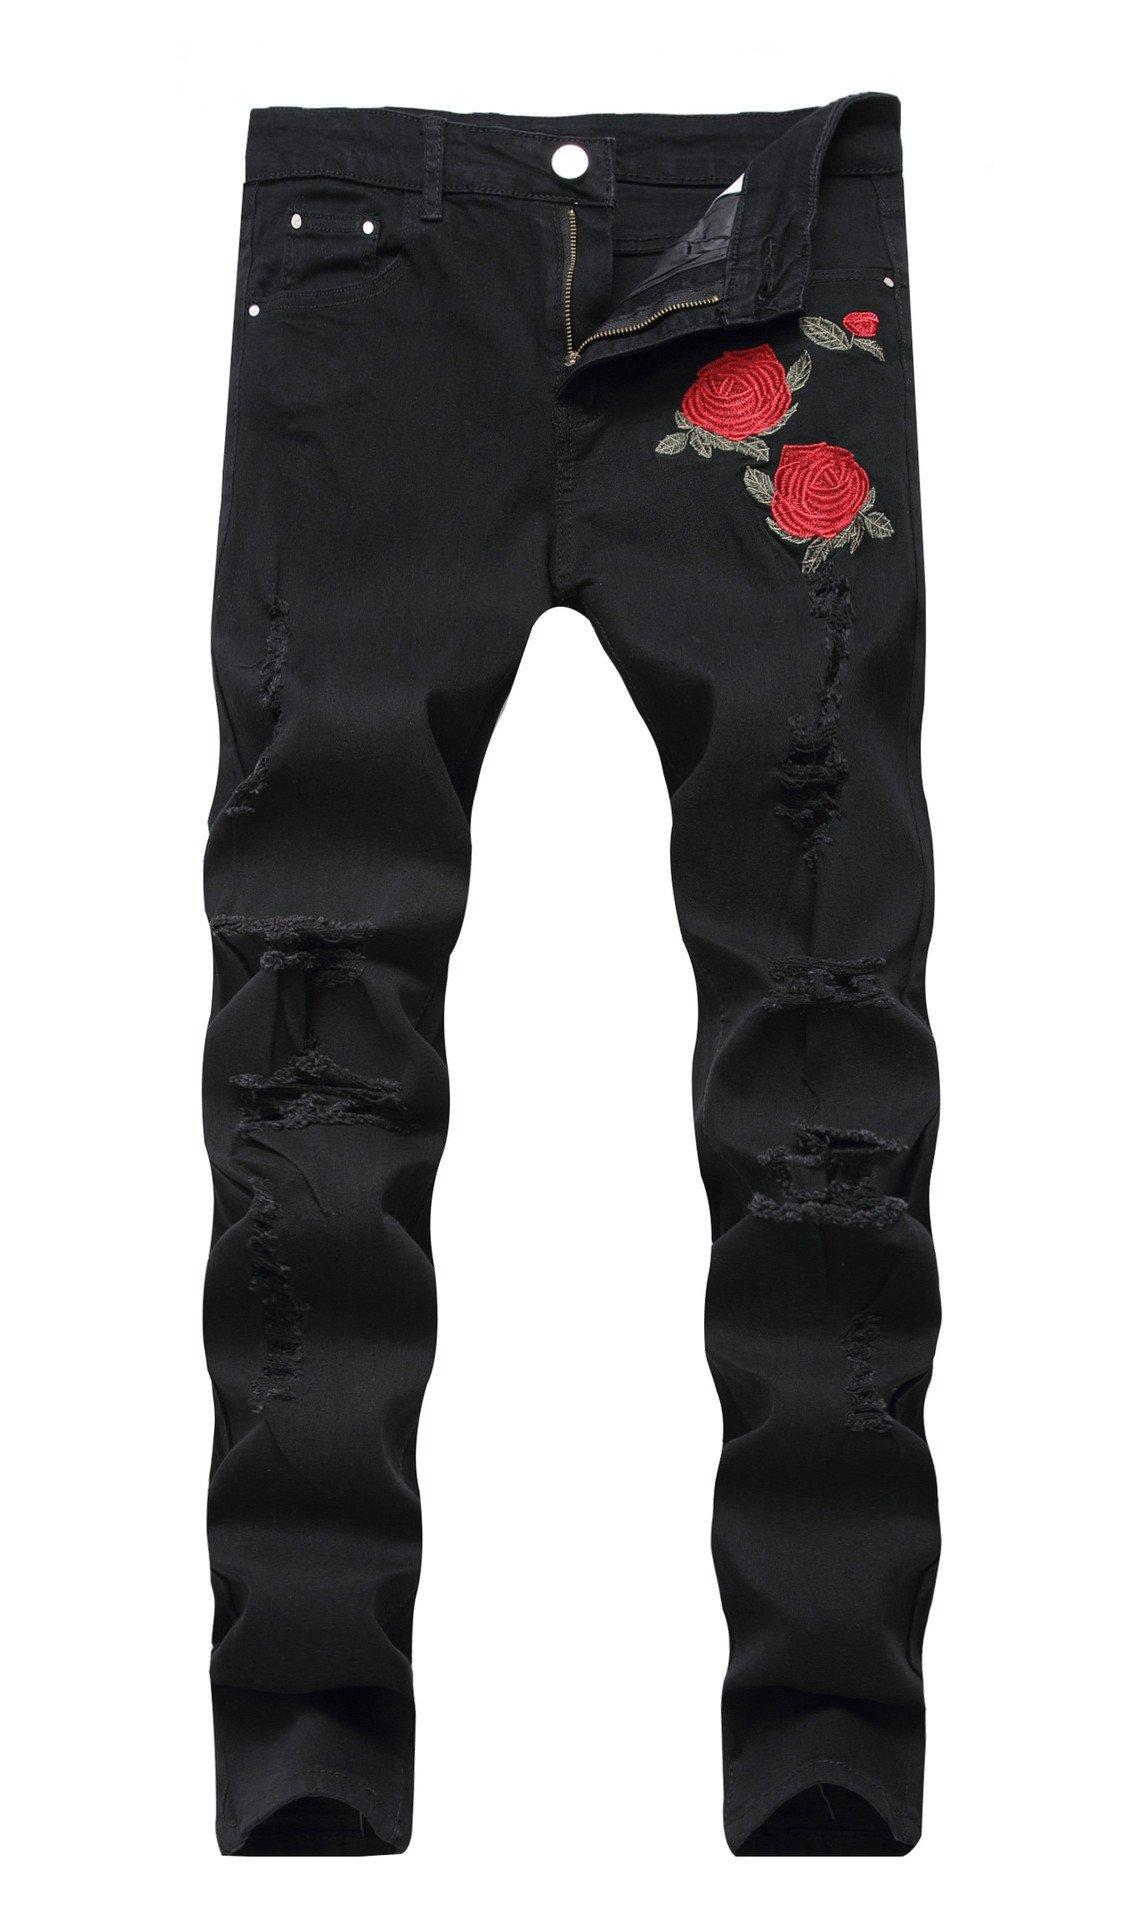 FEESON Men's Straight Leg Slimming Fit Distressed Loose Denim Jeans Black W32